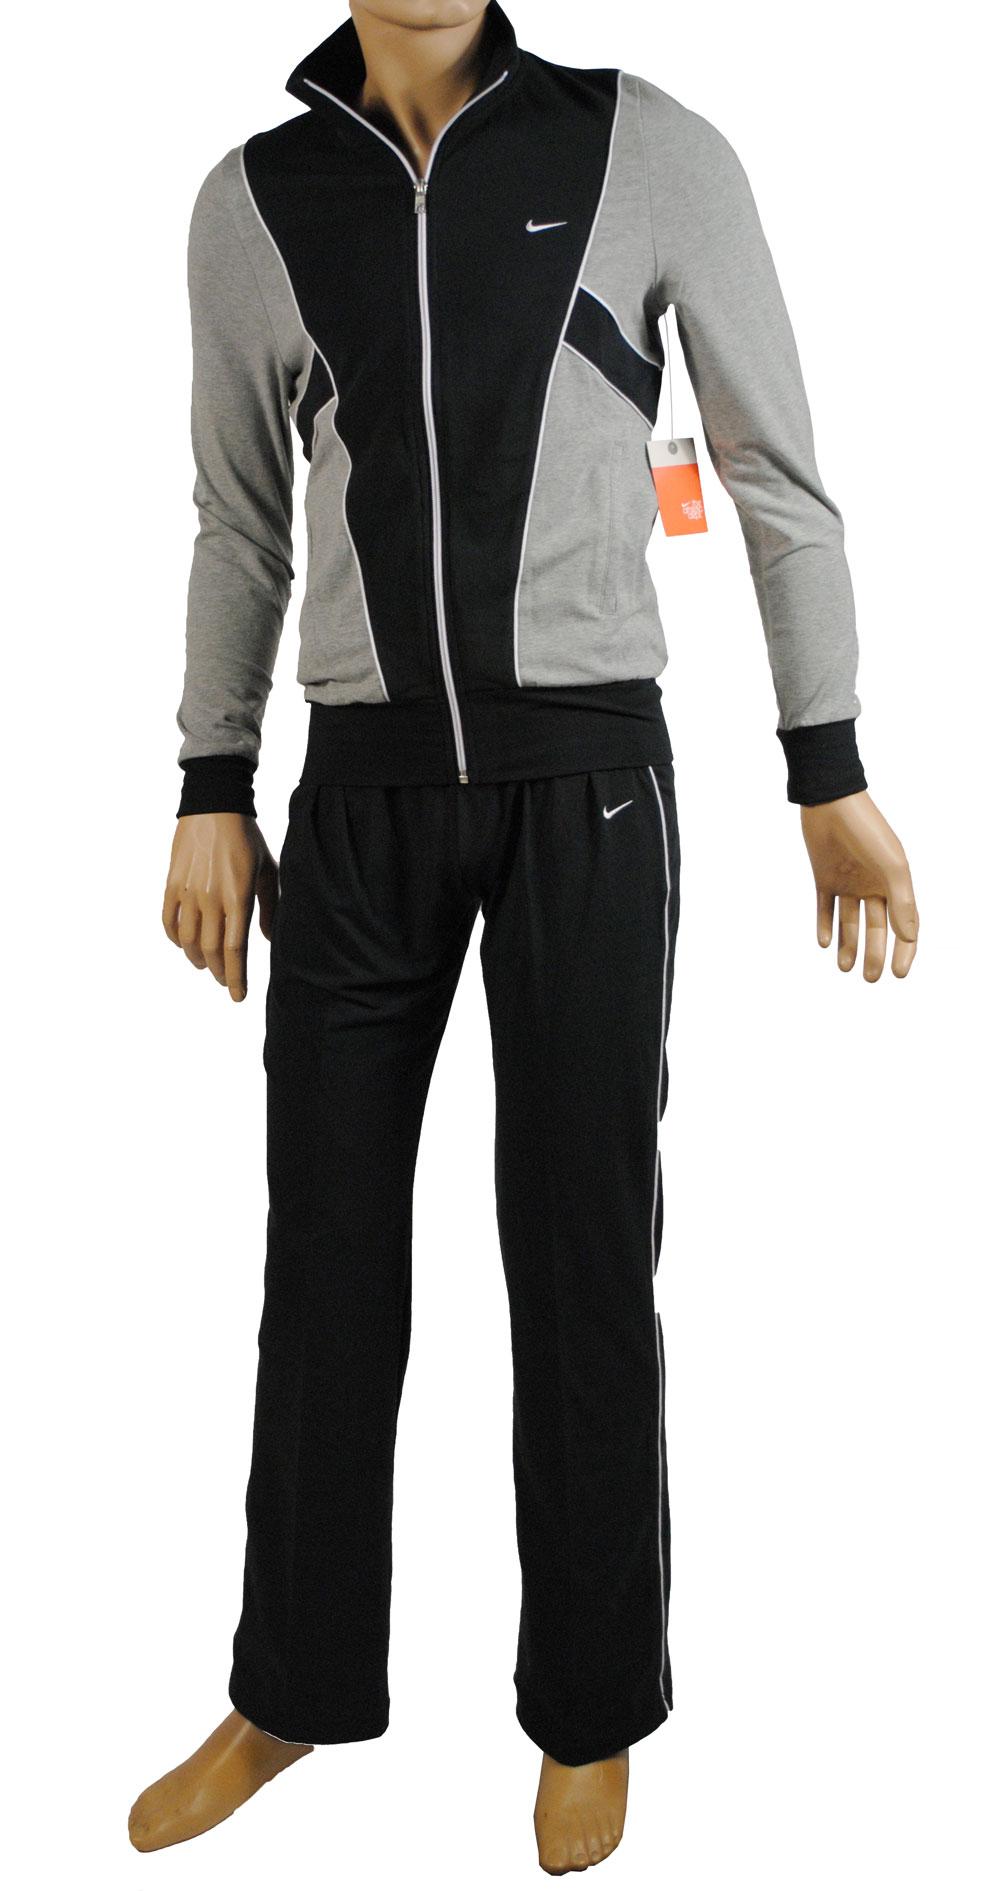 nike trainingsanzug classic damen jogginganzug women 90. Black Bedroom Furniture Sets. Home Design Ideas